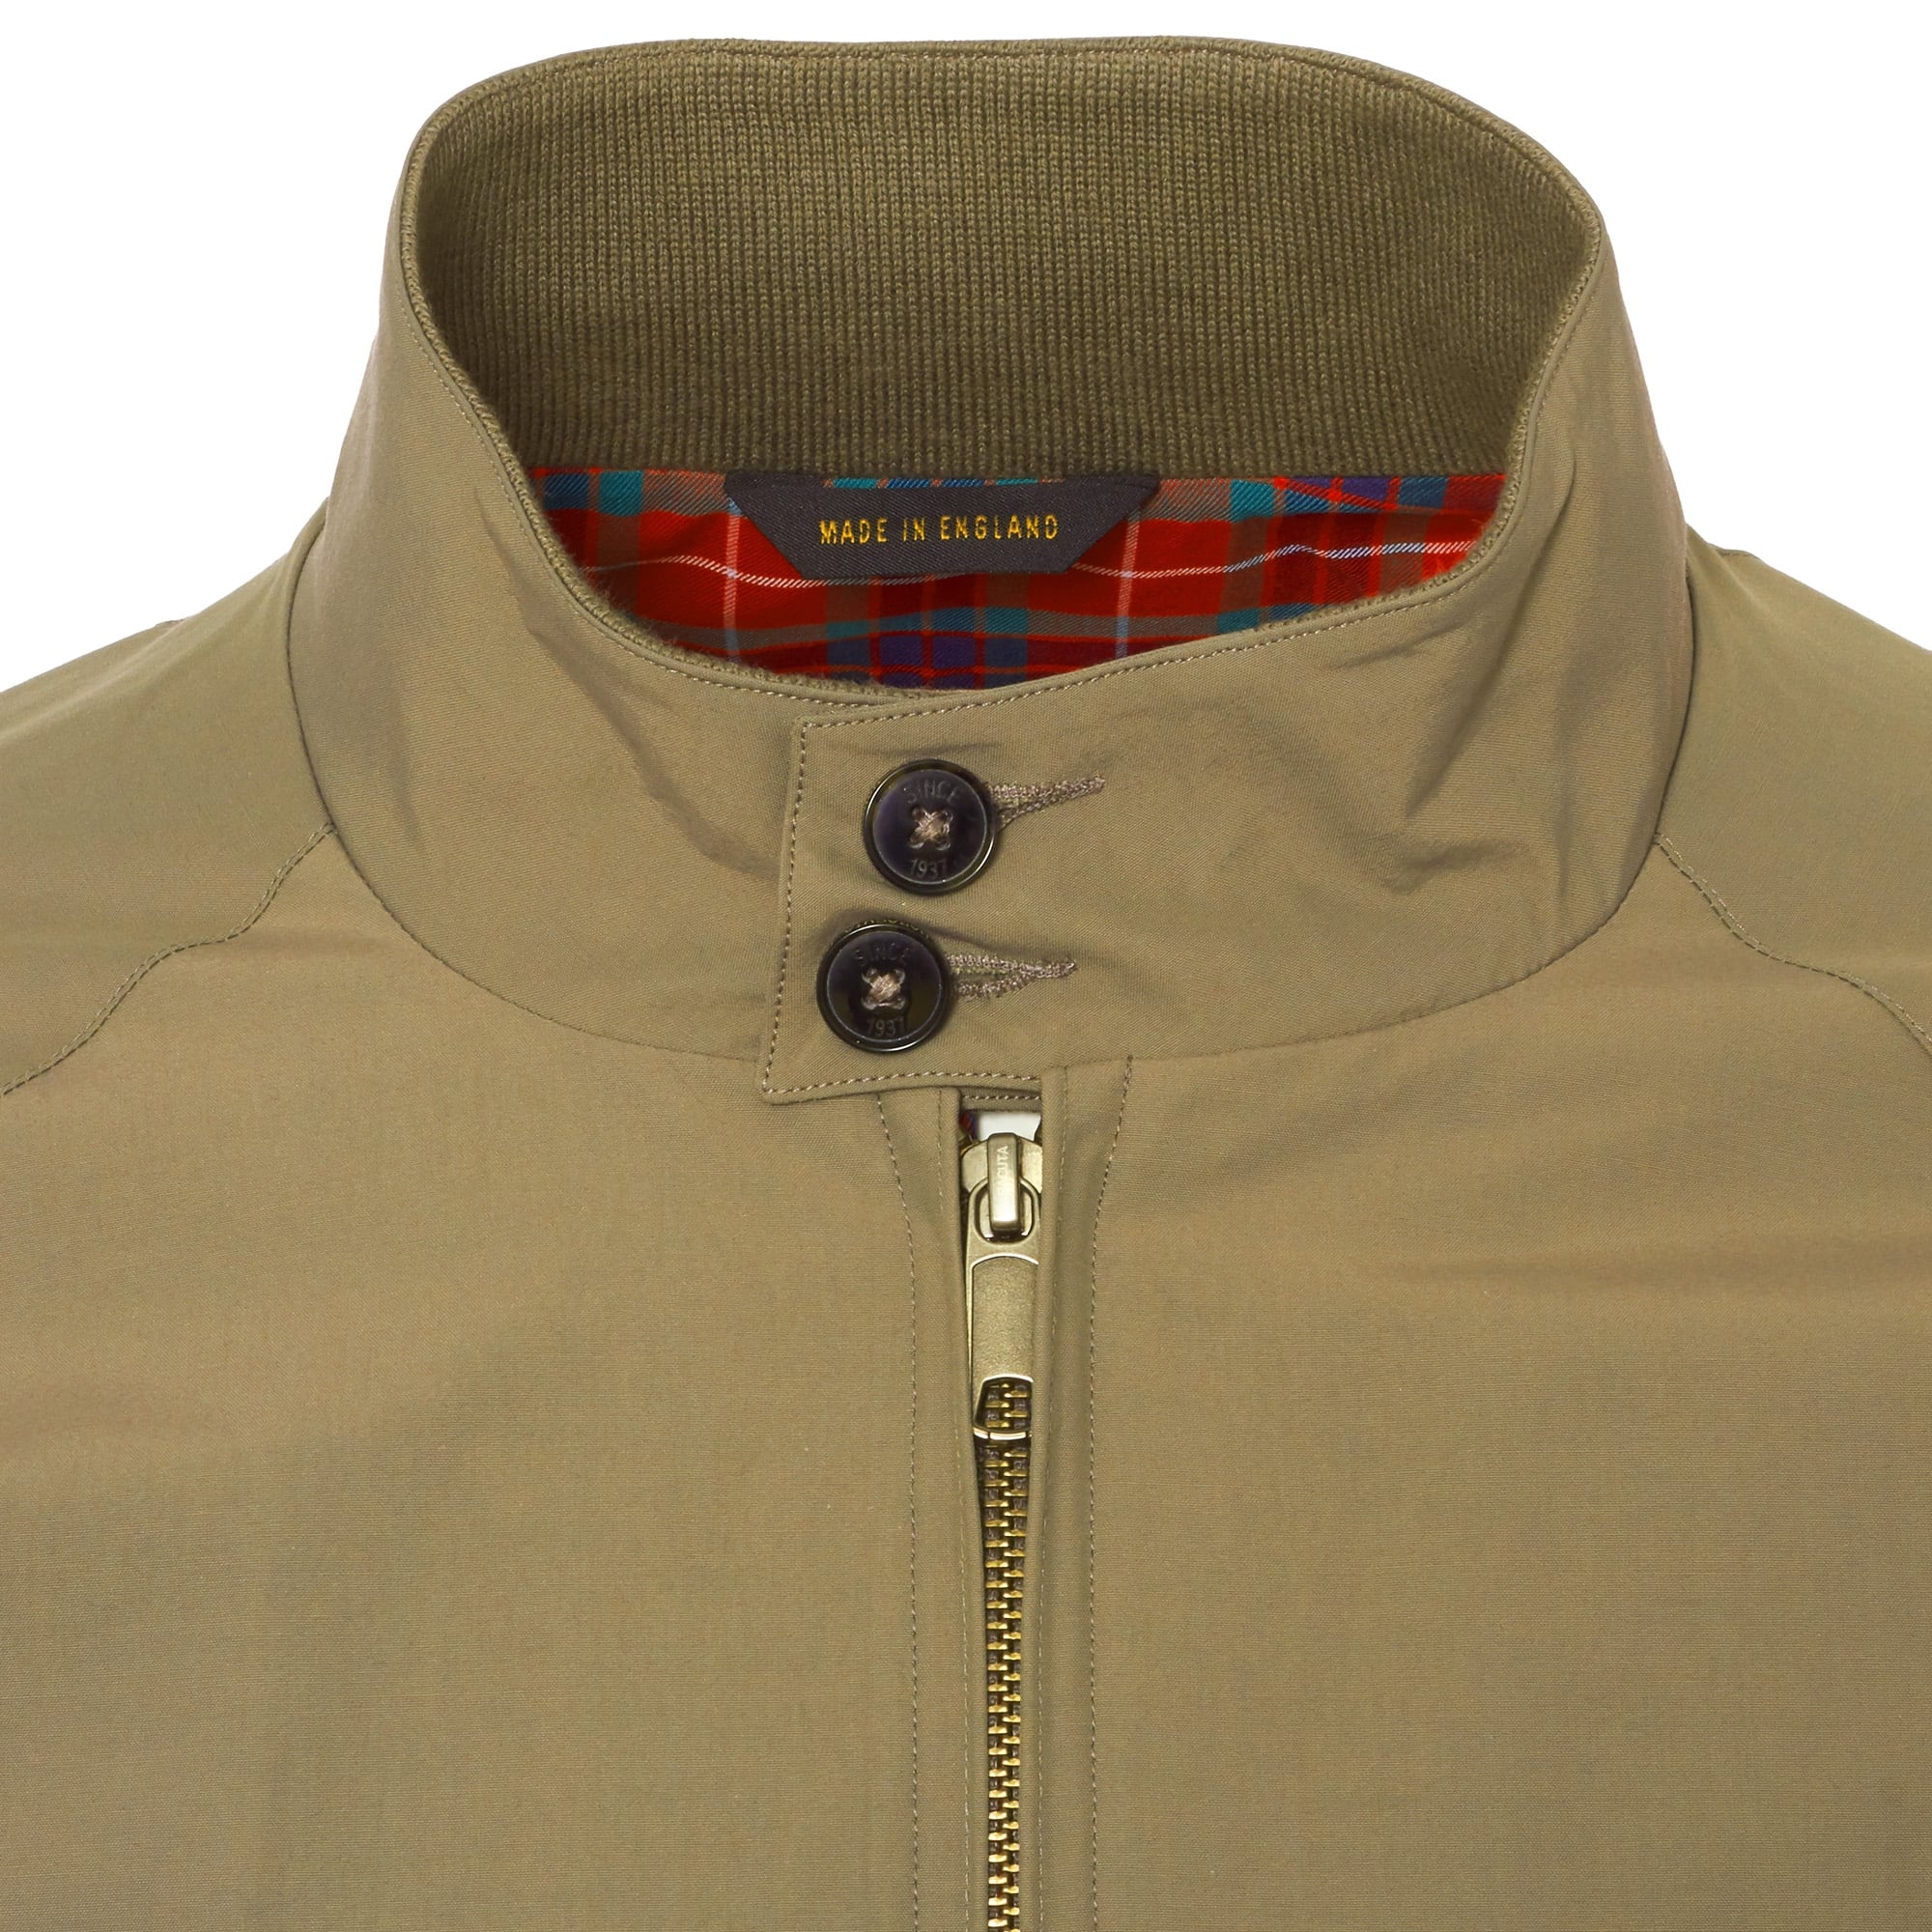 14bde2db0cc56 Baracuta G9 Original Harrington Jacket Tan BRCPS0001